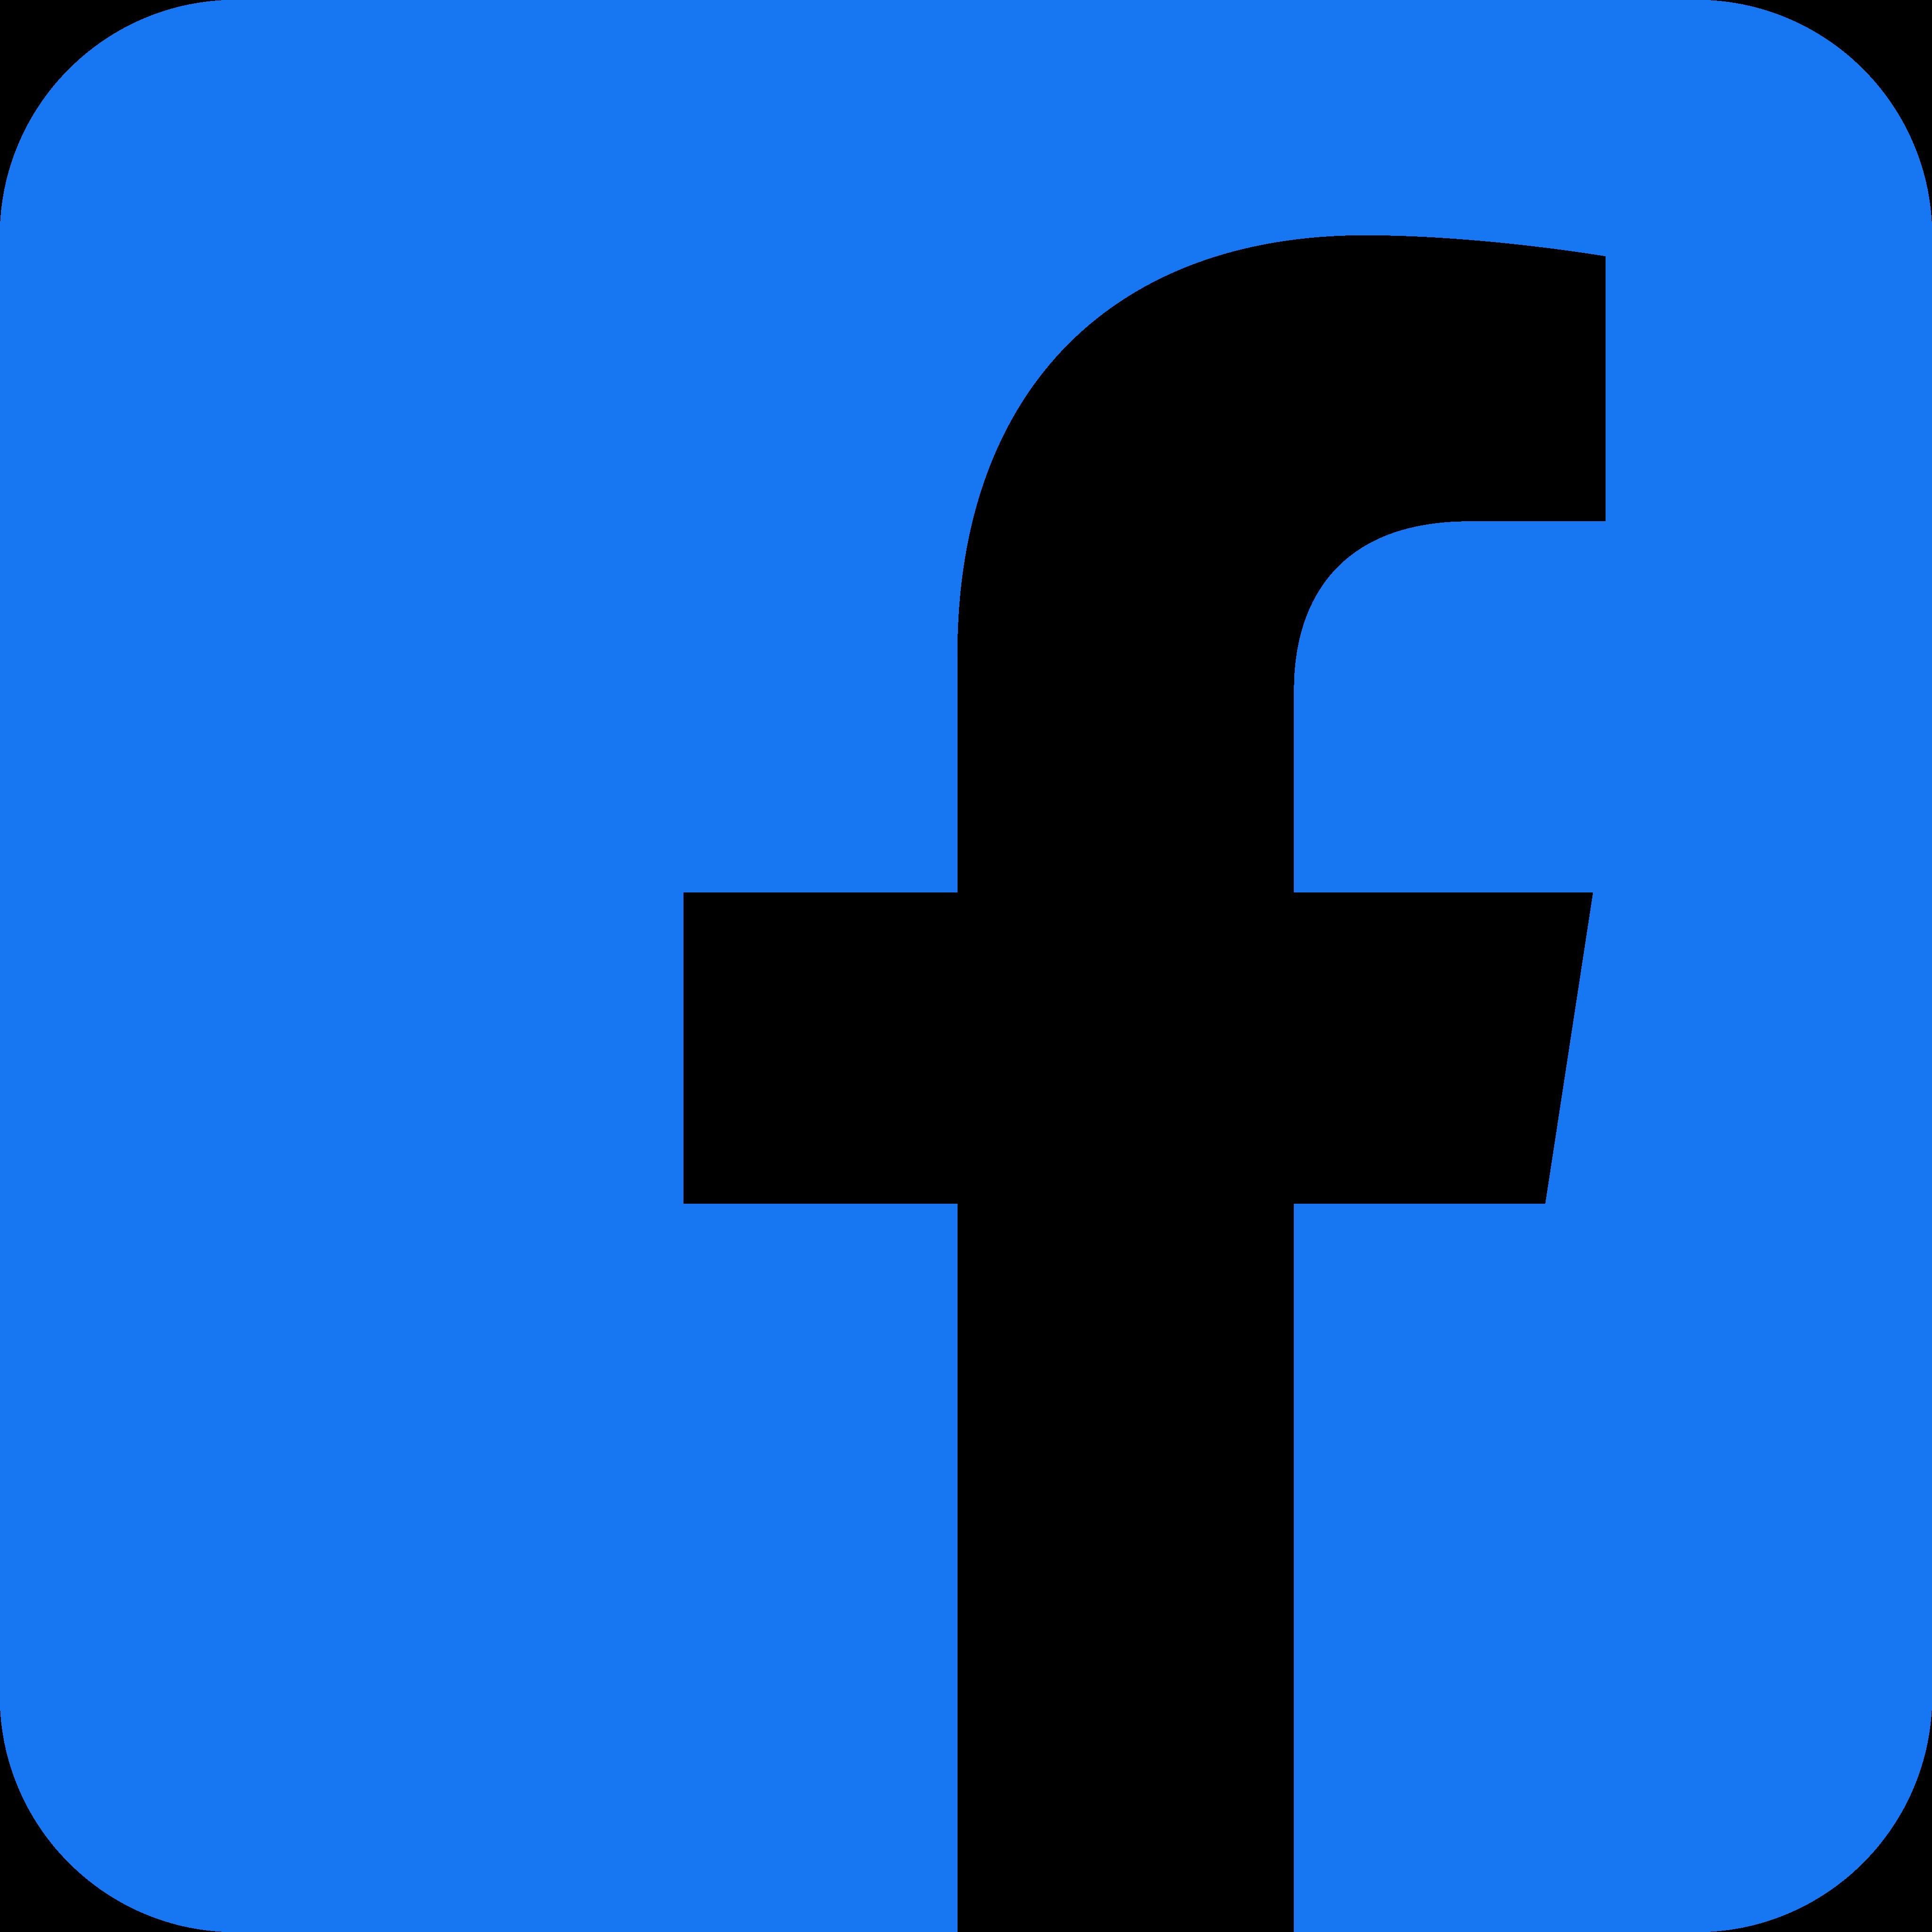 Link to IMPDET Facebook